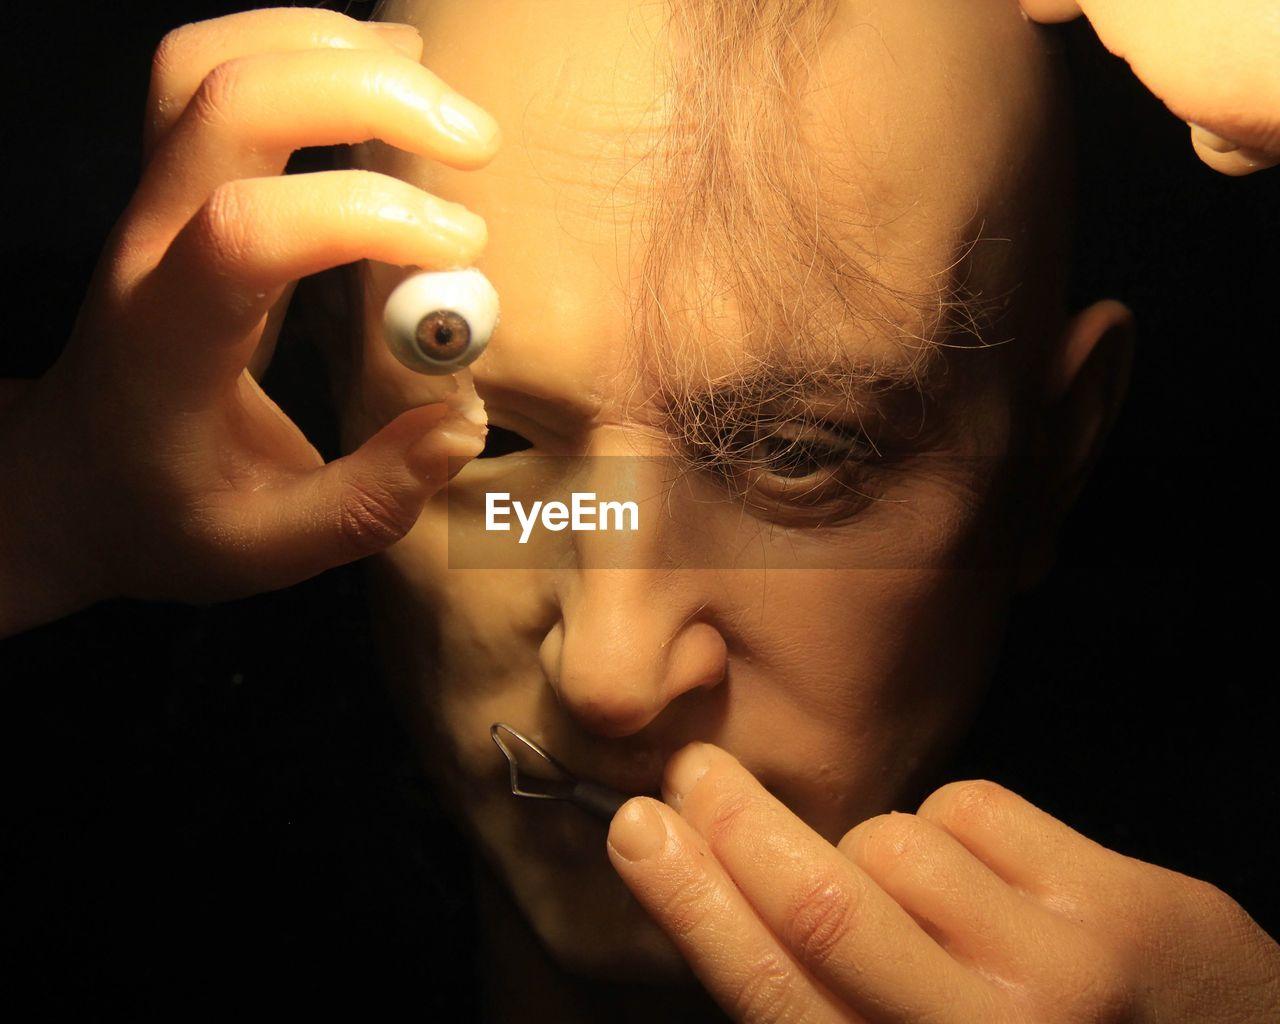 human eye, human body part, human hand, human face, close-up, real people, childhood, holding, make-up, black background, leisure activity, human nose, indoors, eyelash, eyebrow, eyesight, eyeball, young adult, young women, day, people